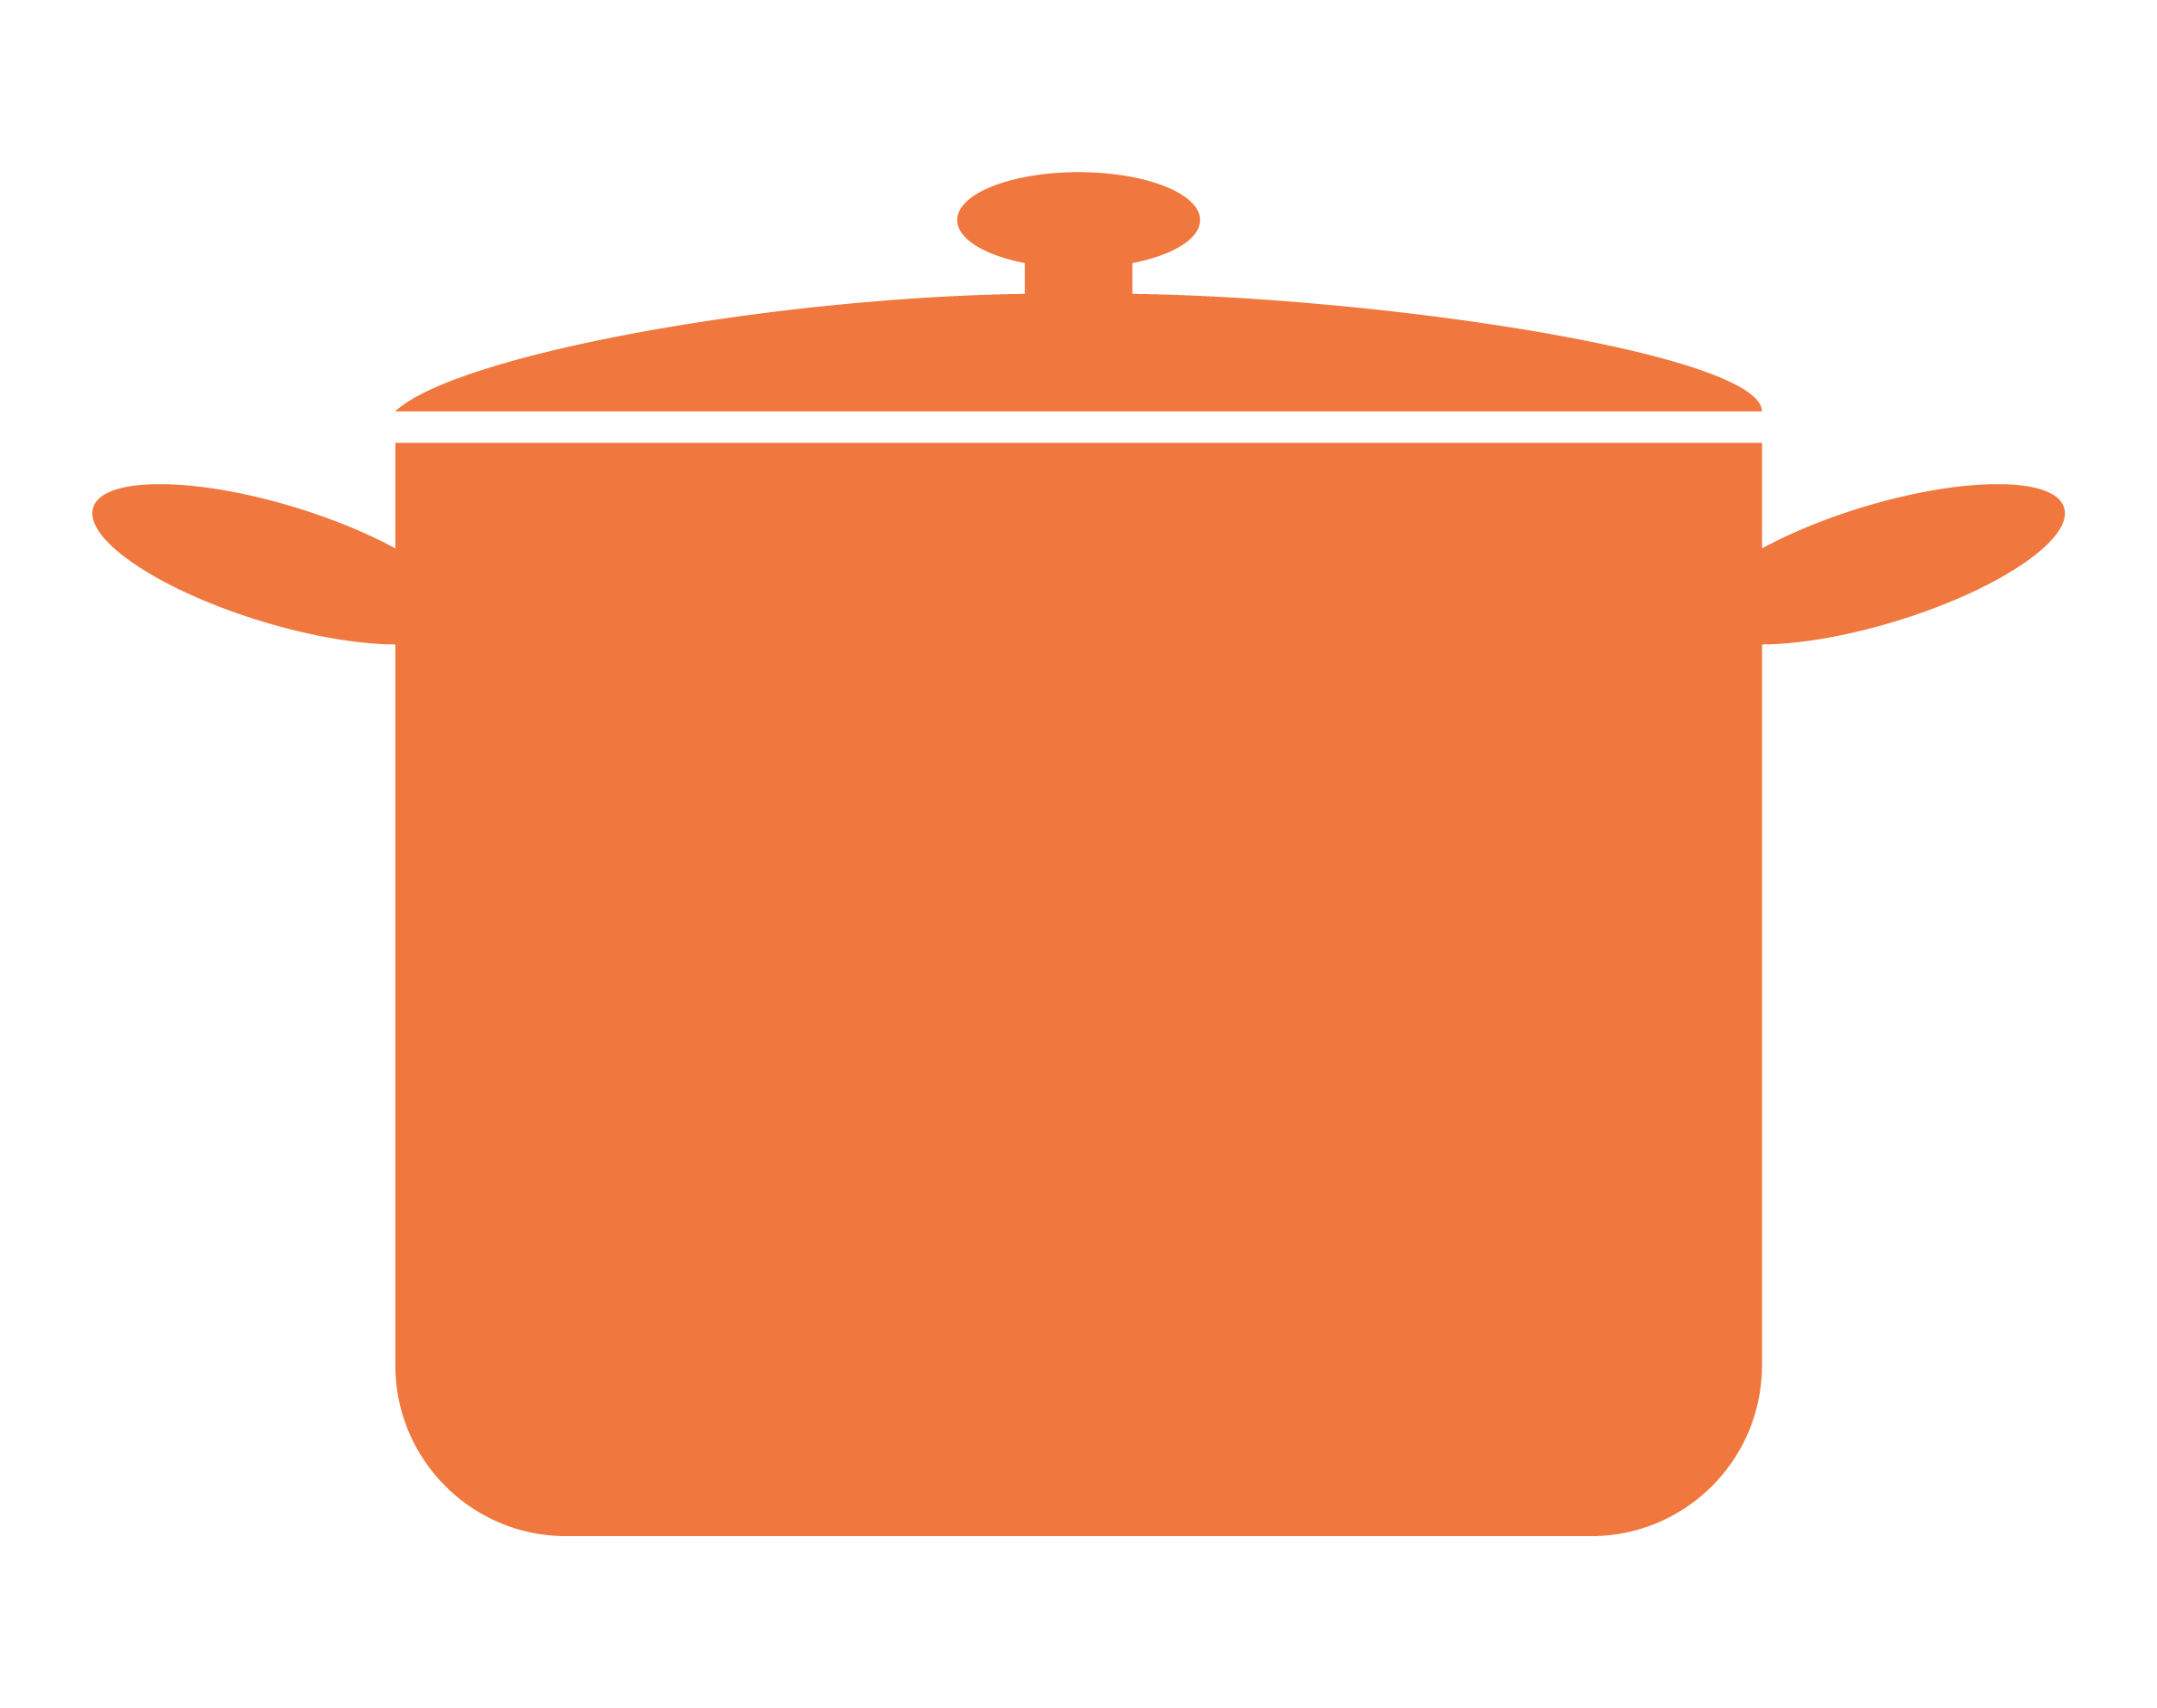 Kitchen Utensils Clip Art Pan-Kitchen Utensils Clip Art Pan-6